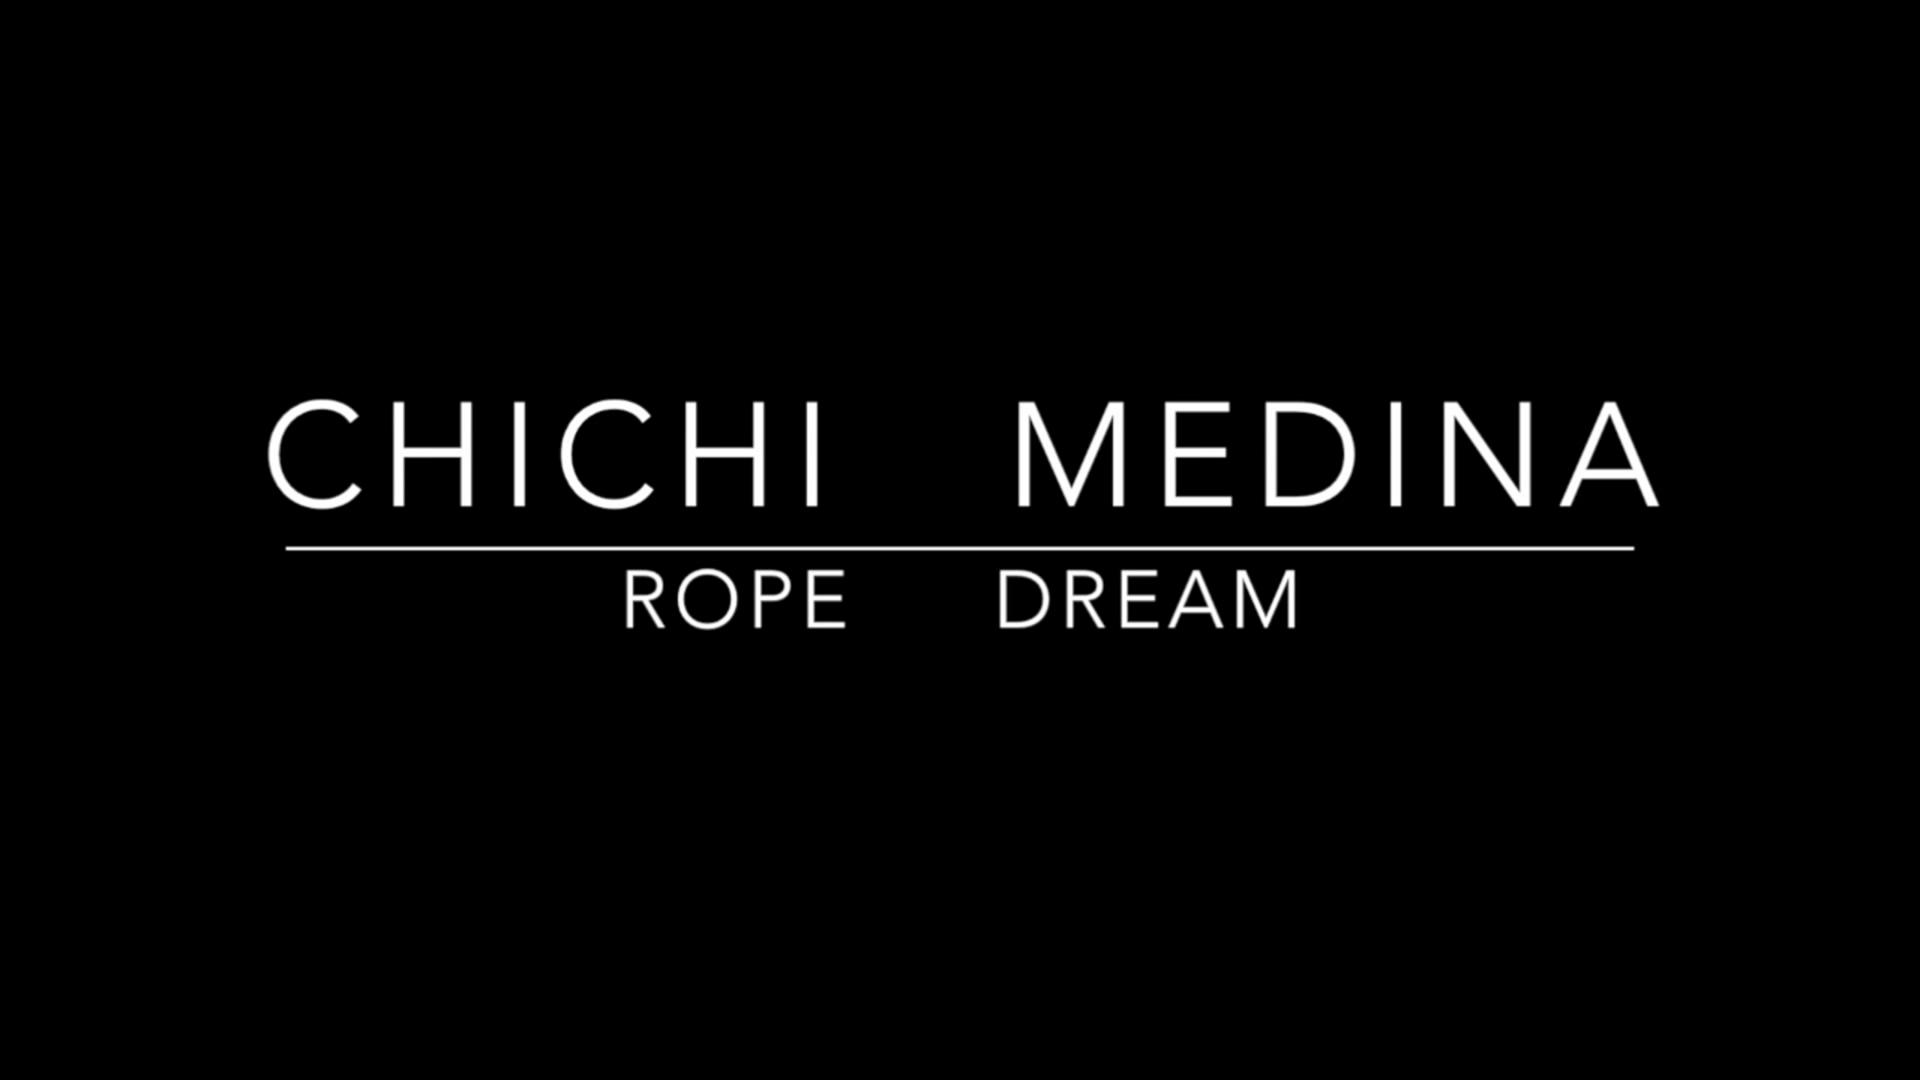 Chichi Medina - Rope Dreams (8 Scenes)